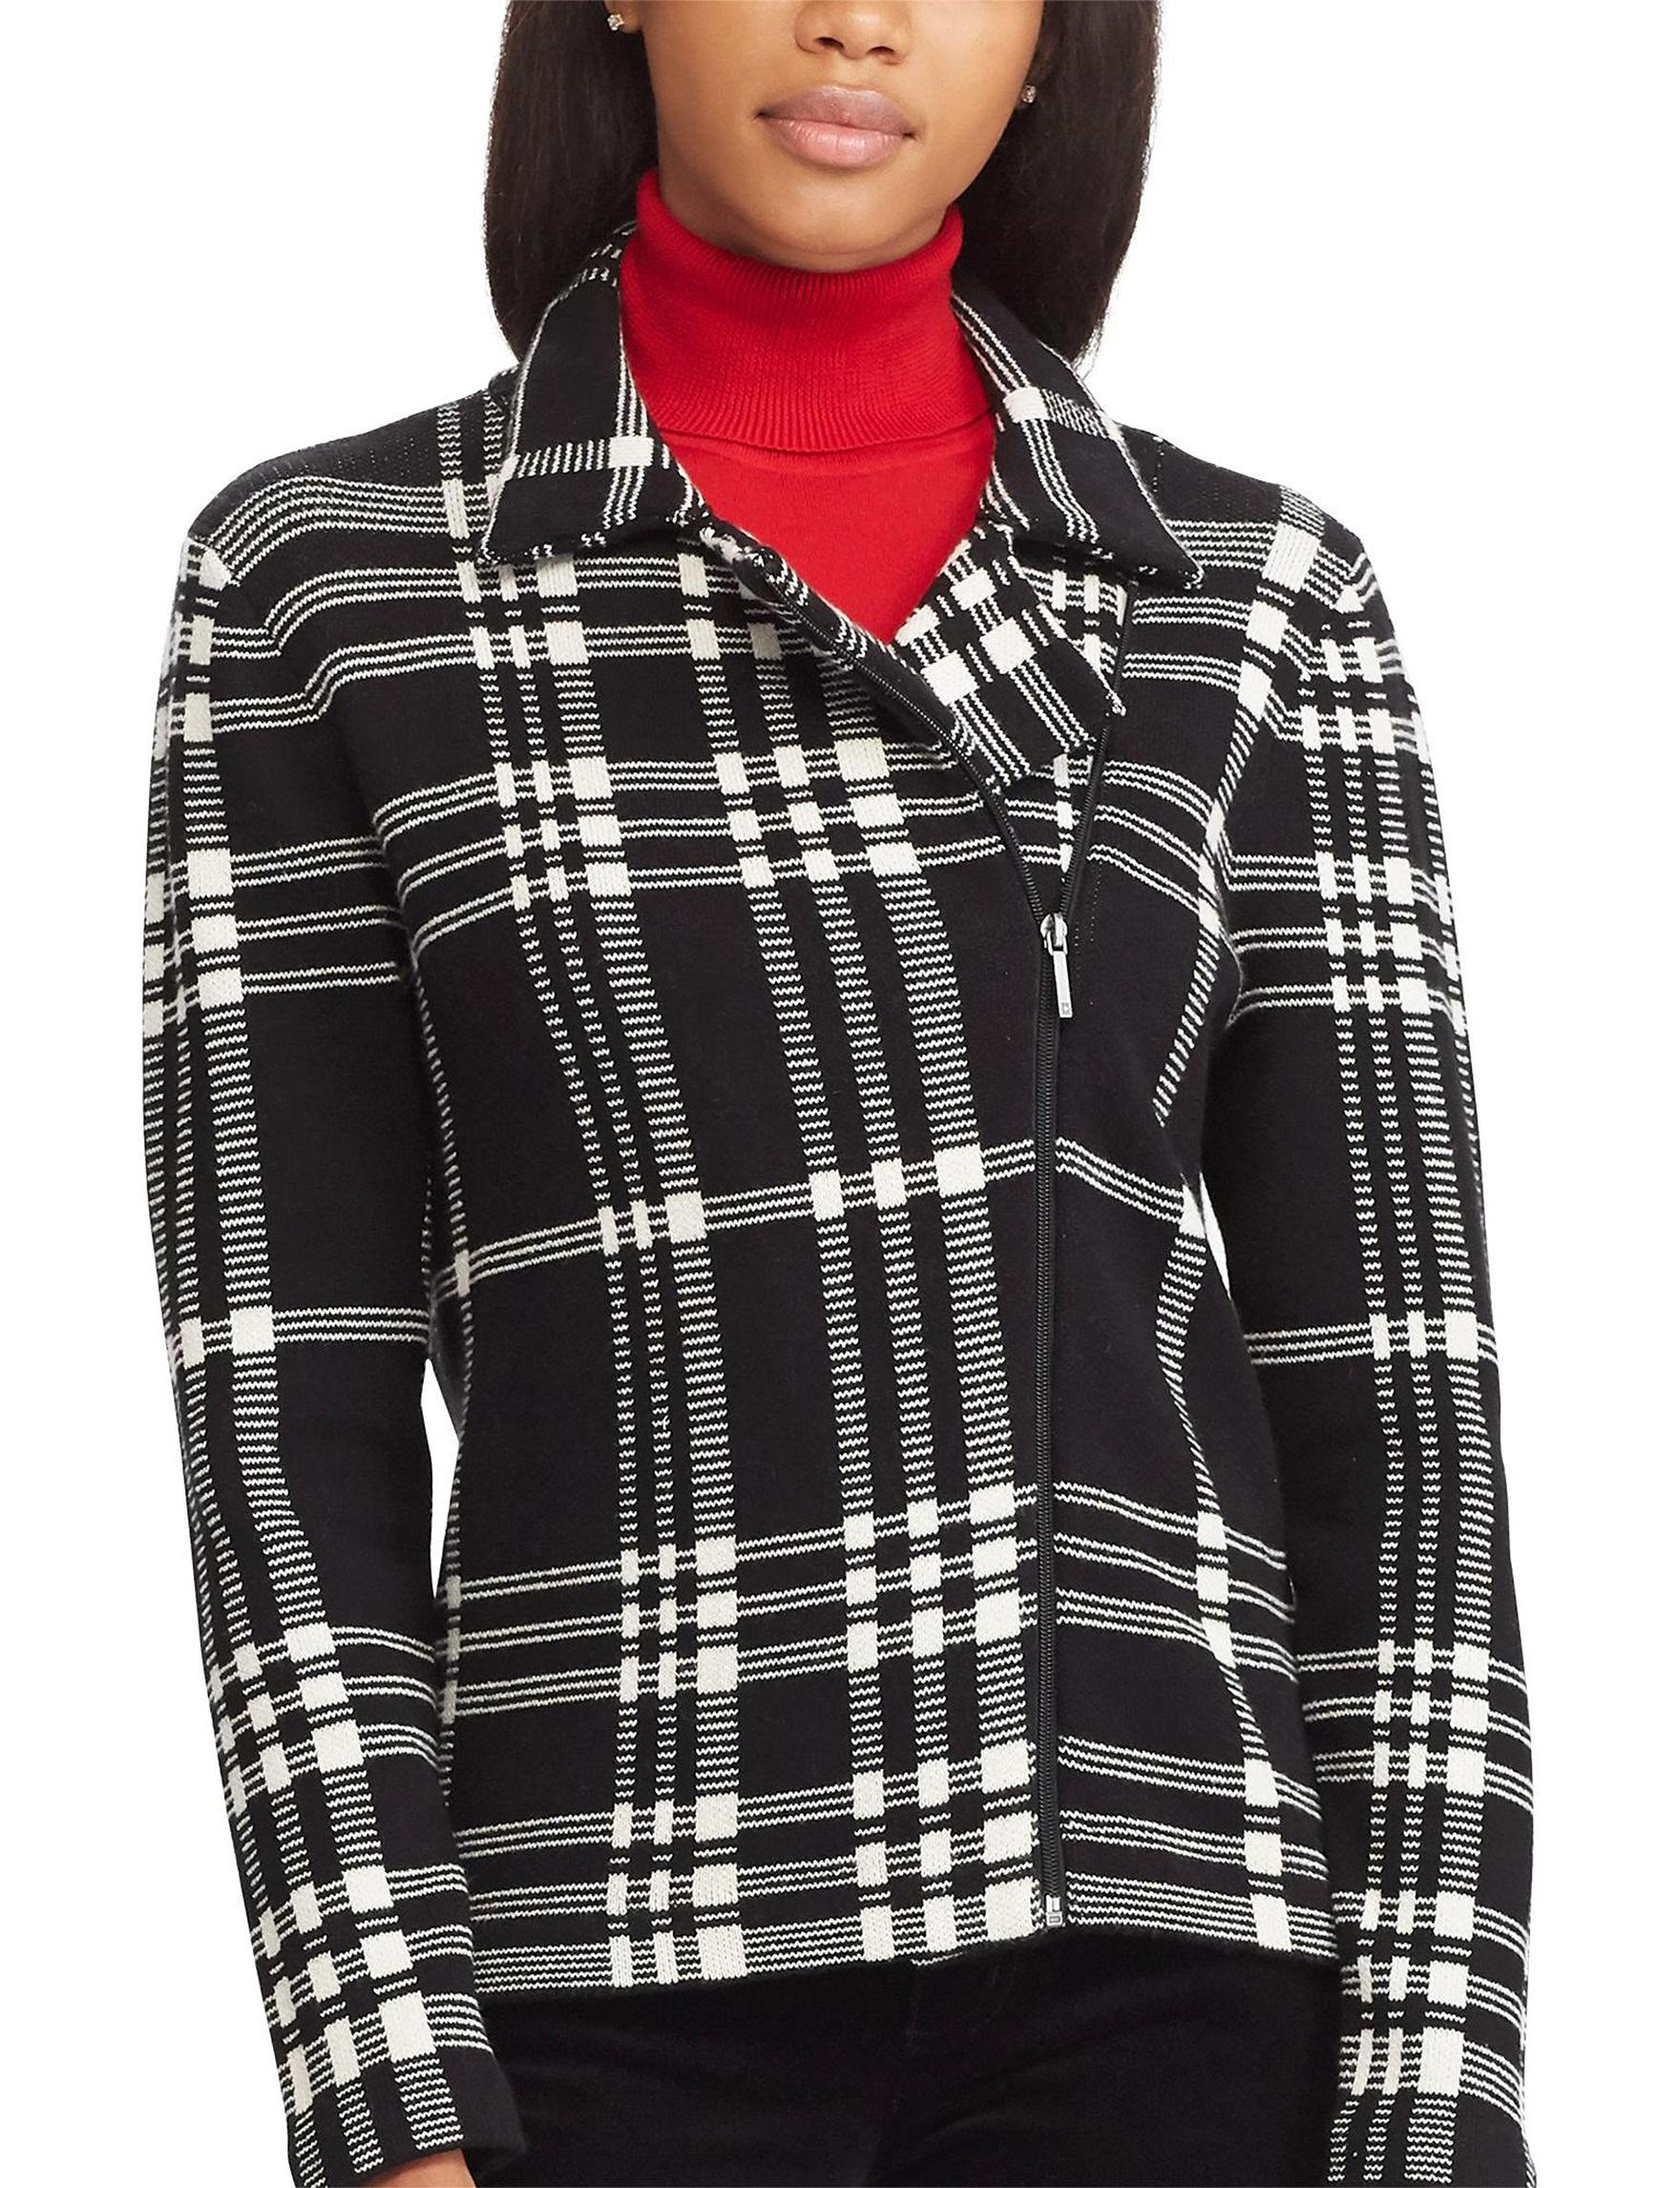 Chaps Black Multi Lightweight Jackets & Blazers